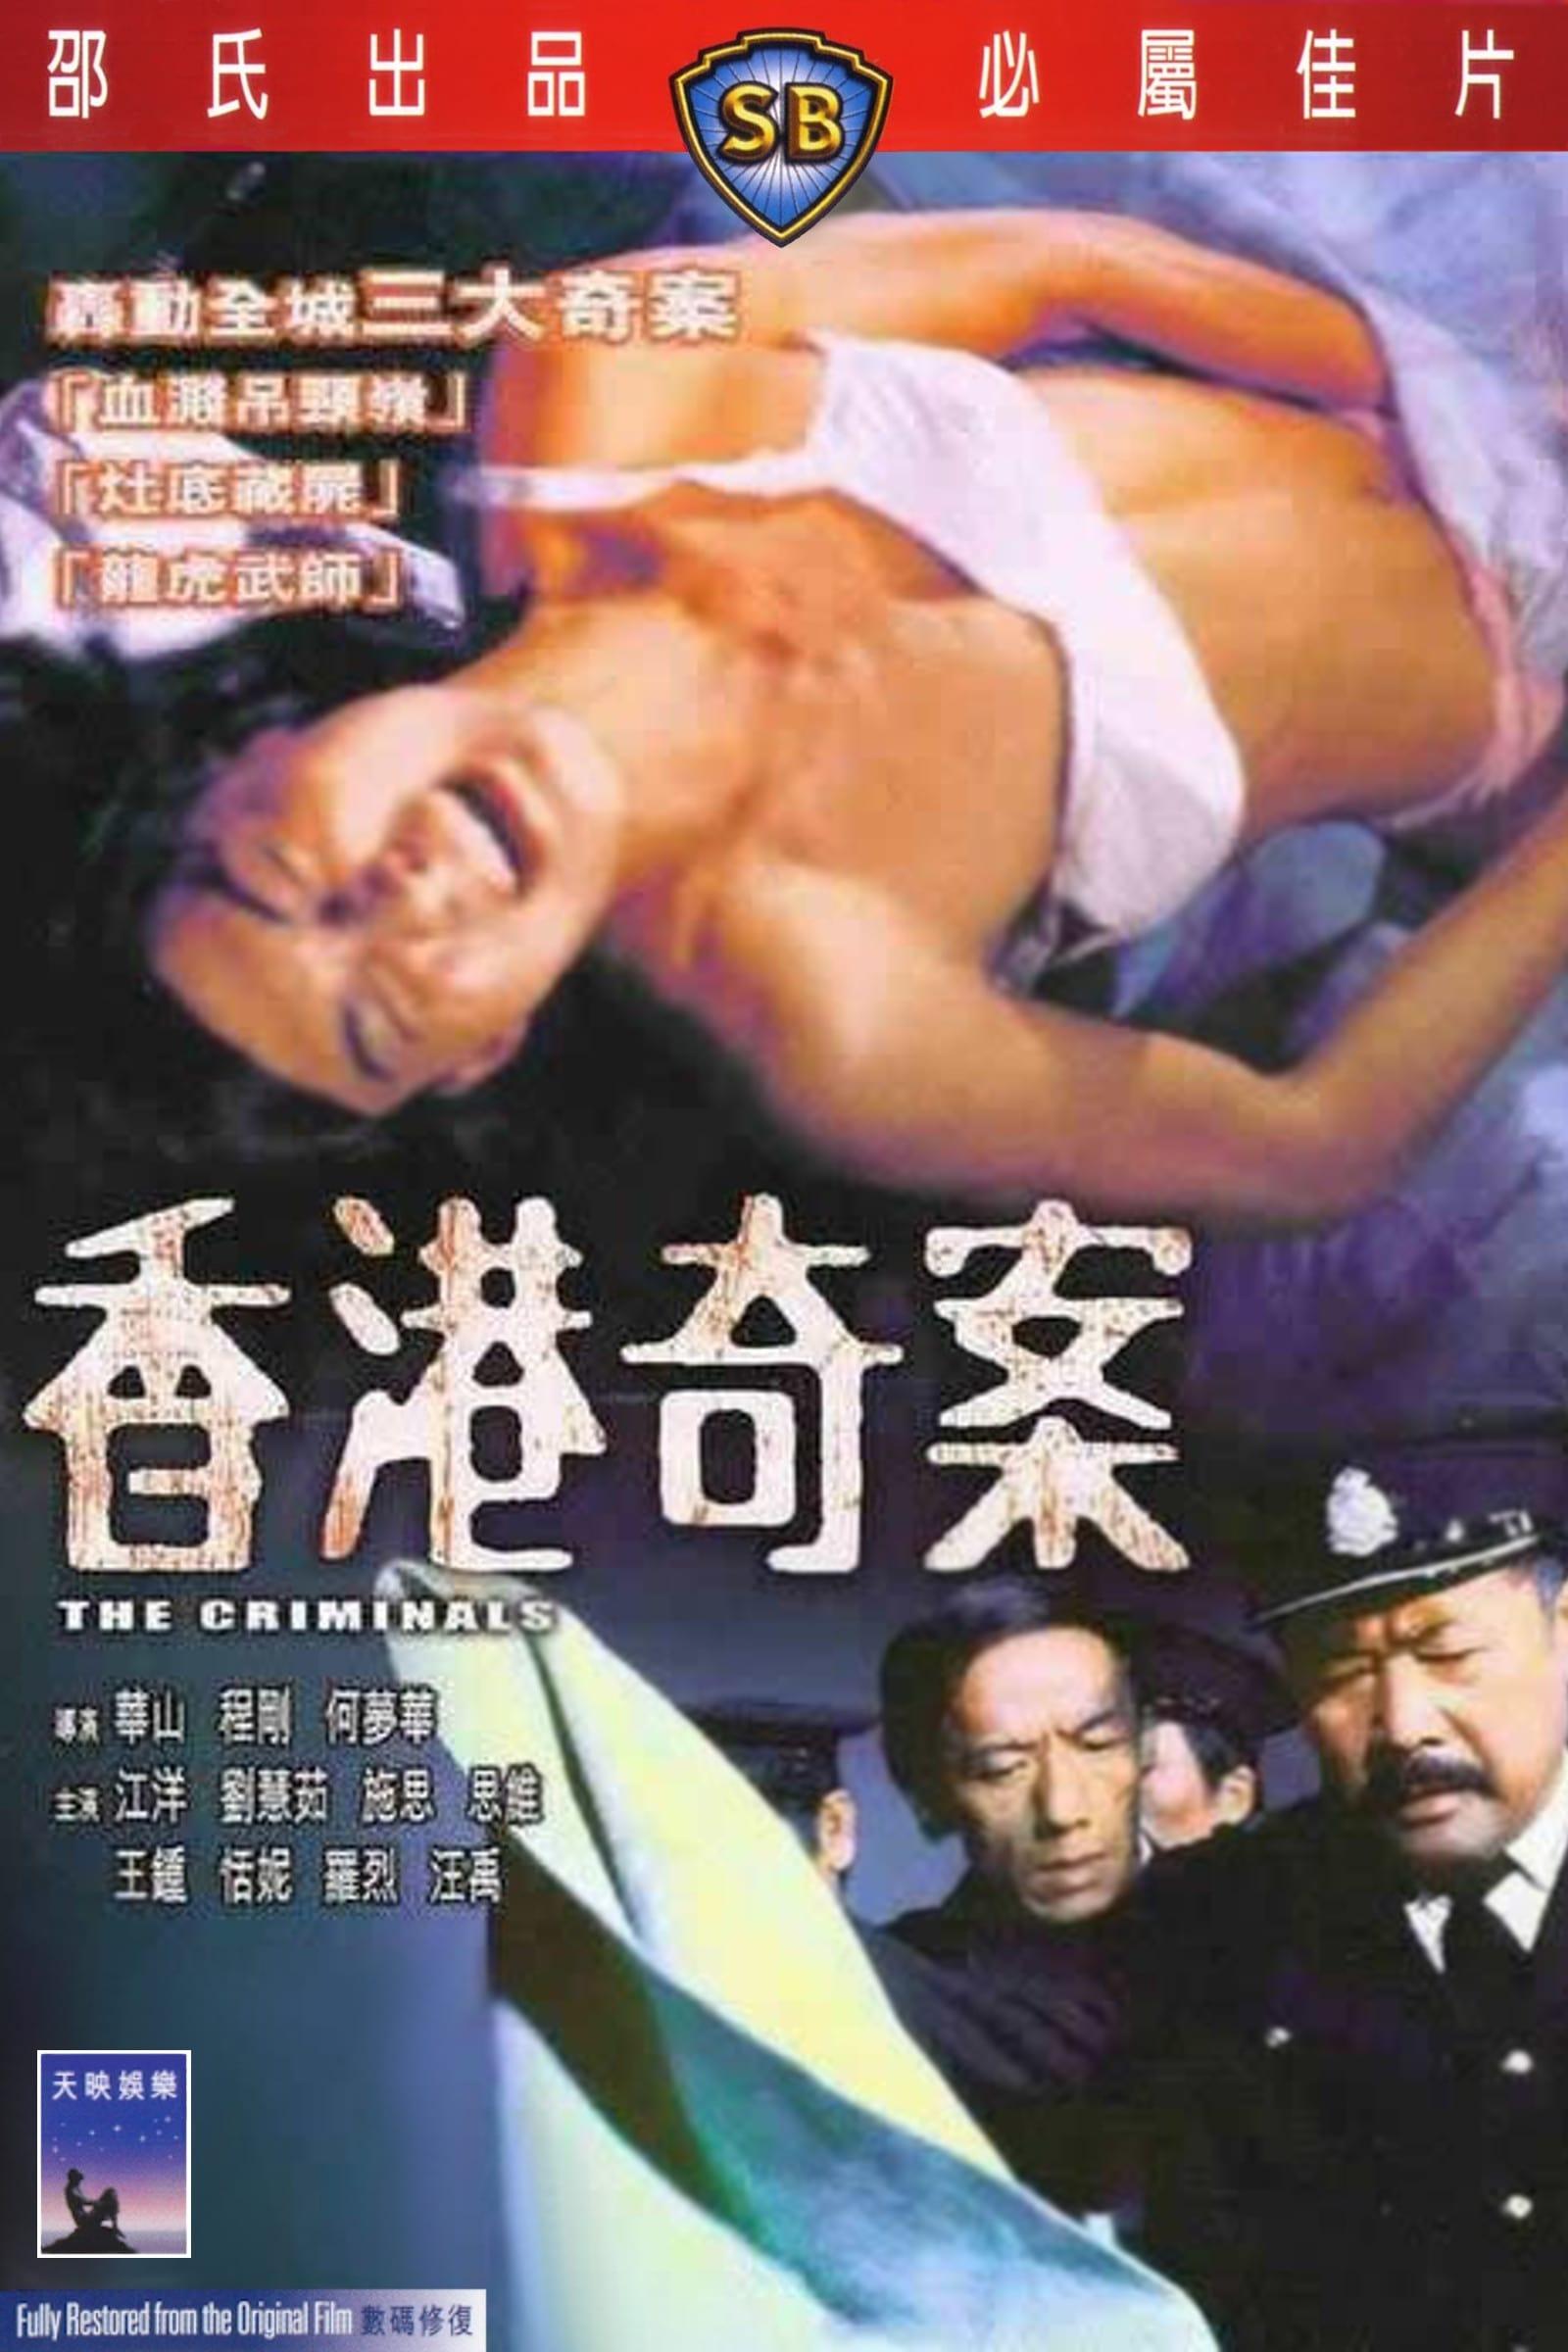 The Criminals (1976)